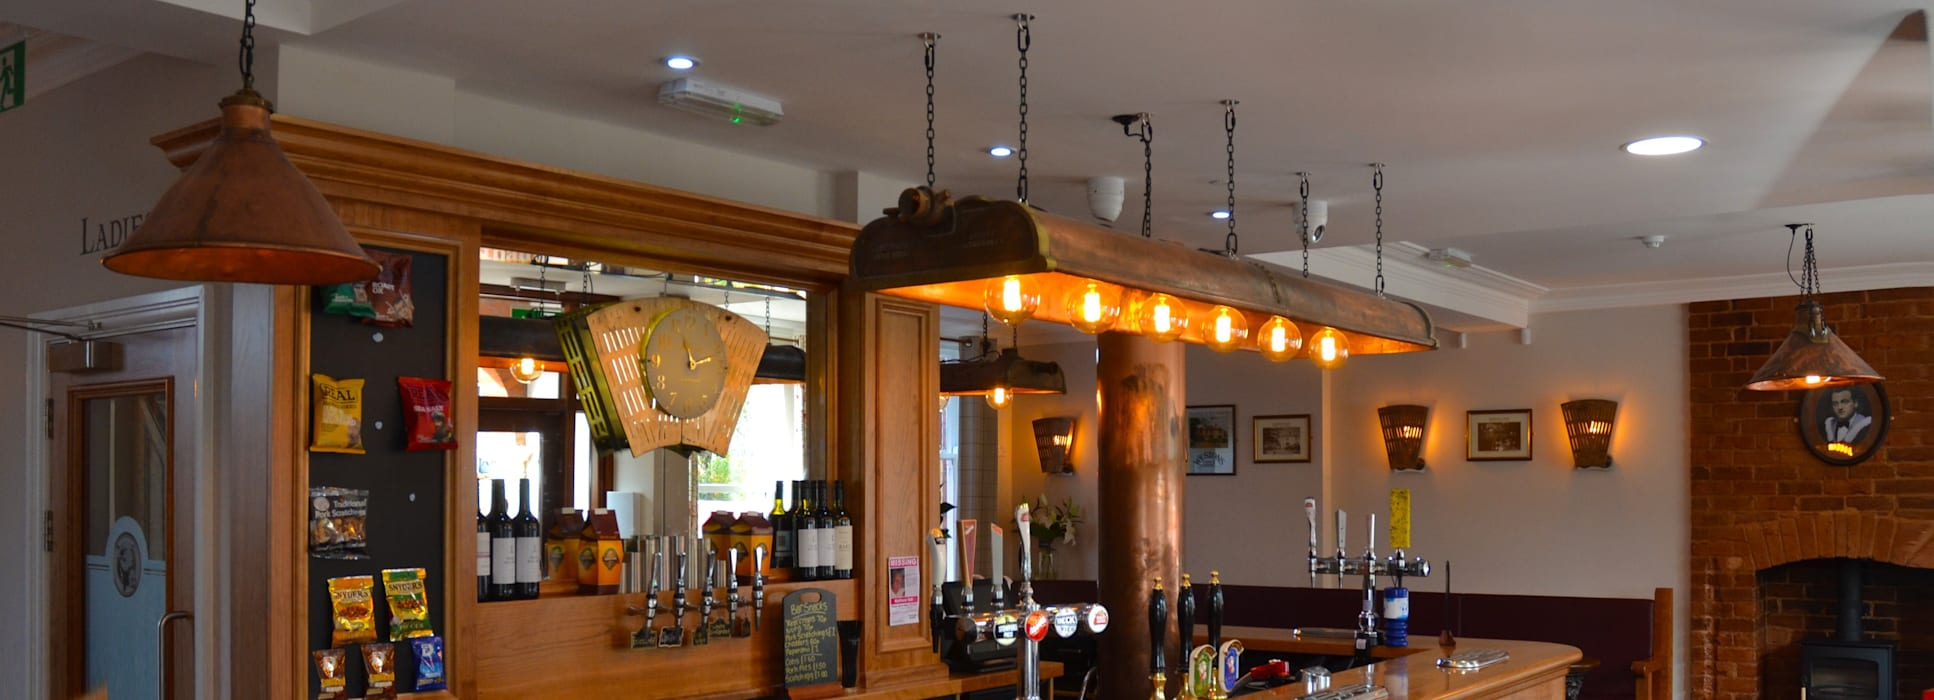 Bar & Klub  oleh it's a light, Eklektik